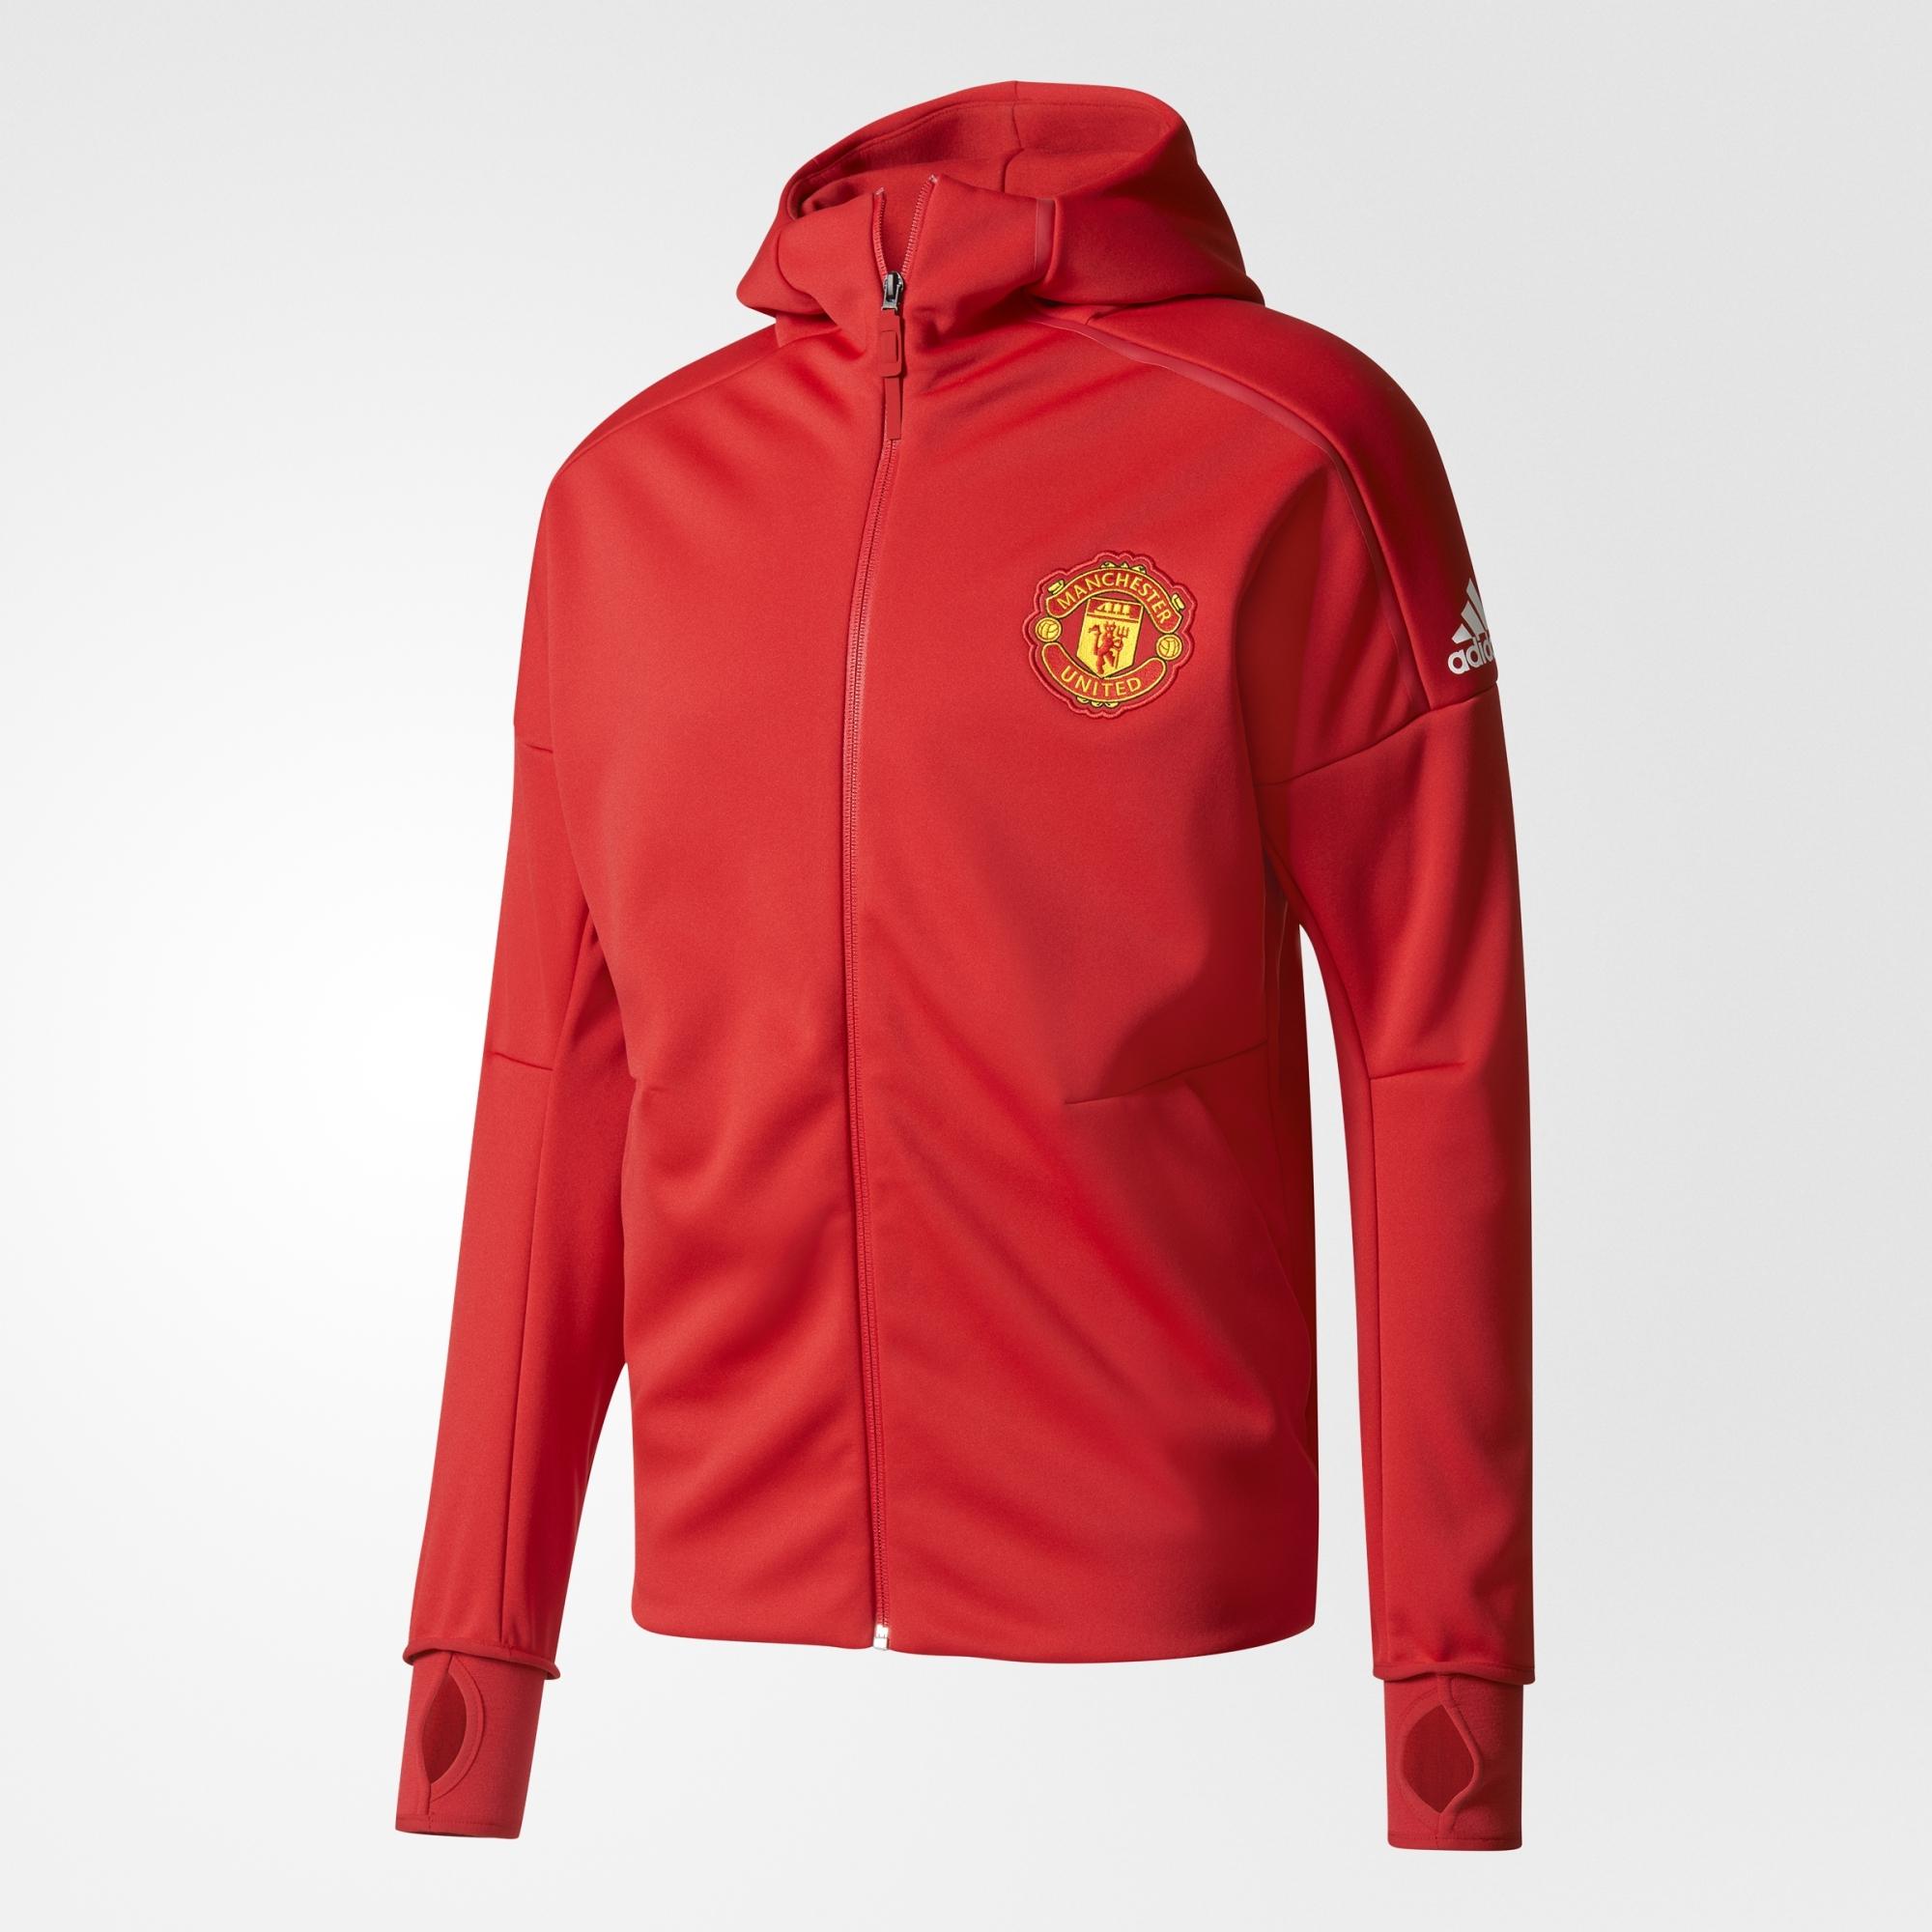 ... in placeWoven Manchester United FC badge on left chestLarge  high-density print adidas brandmark on left shoulderRegular fit100%  polyester interlock